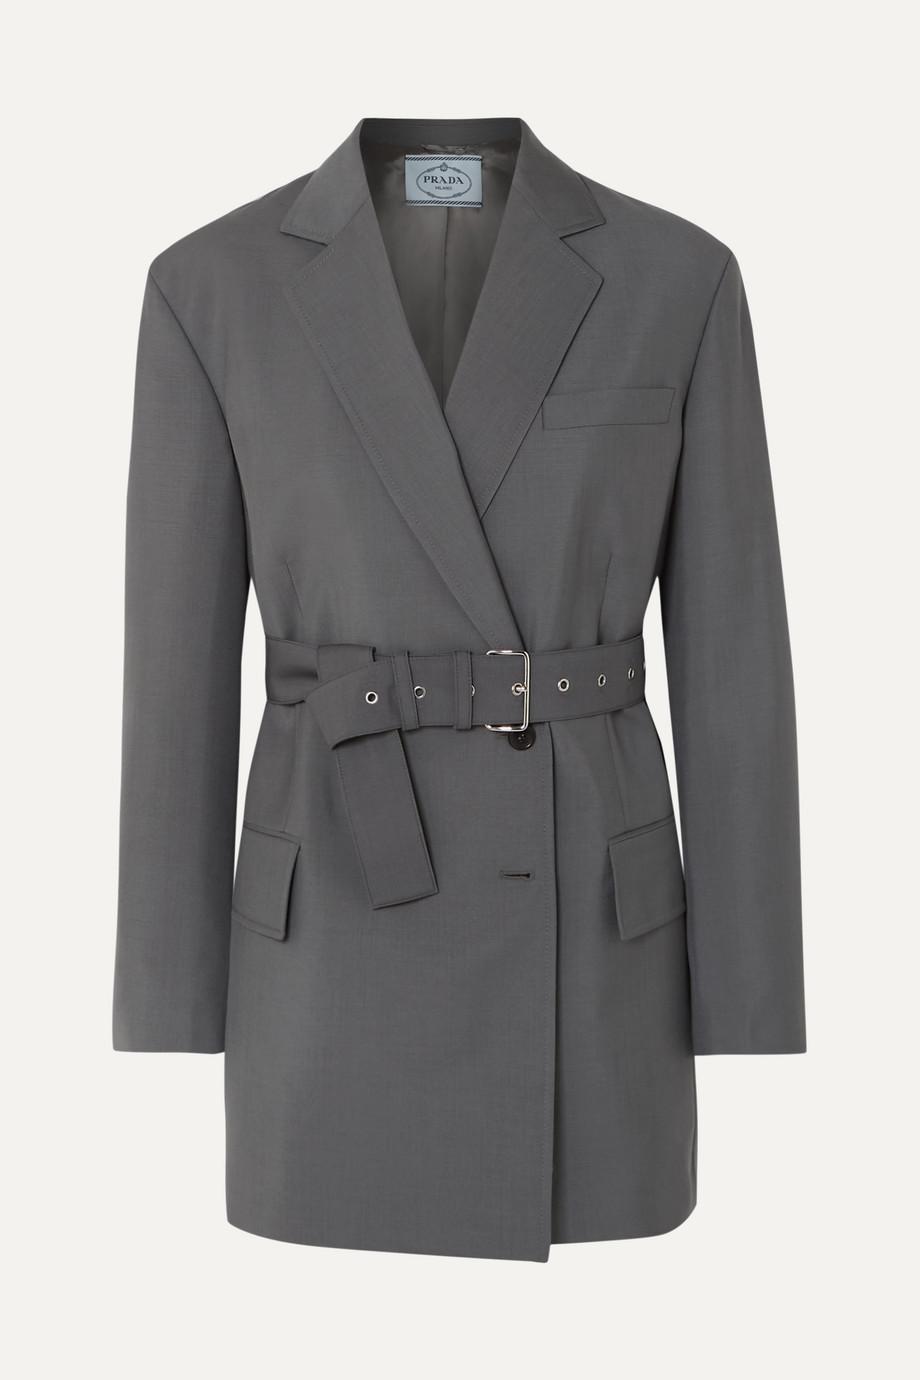 Prada Belted mohair and wool-blend blazer